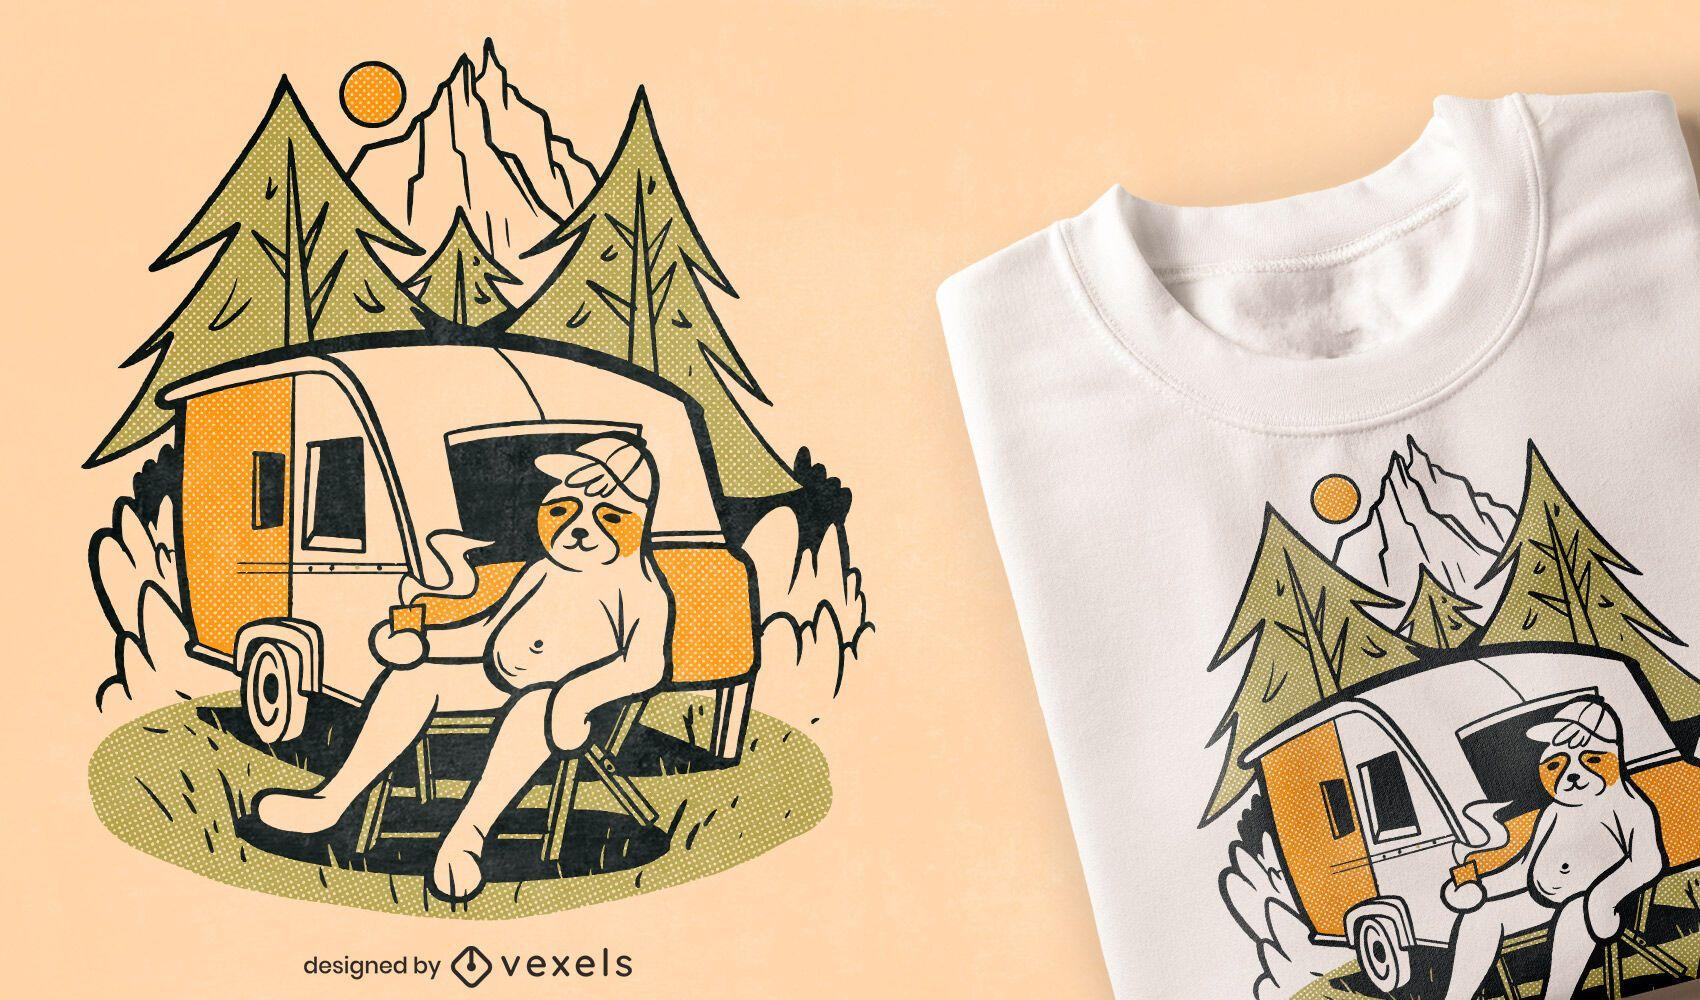 Sloth camping cartoon t-shirt design